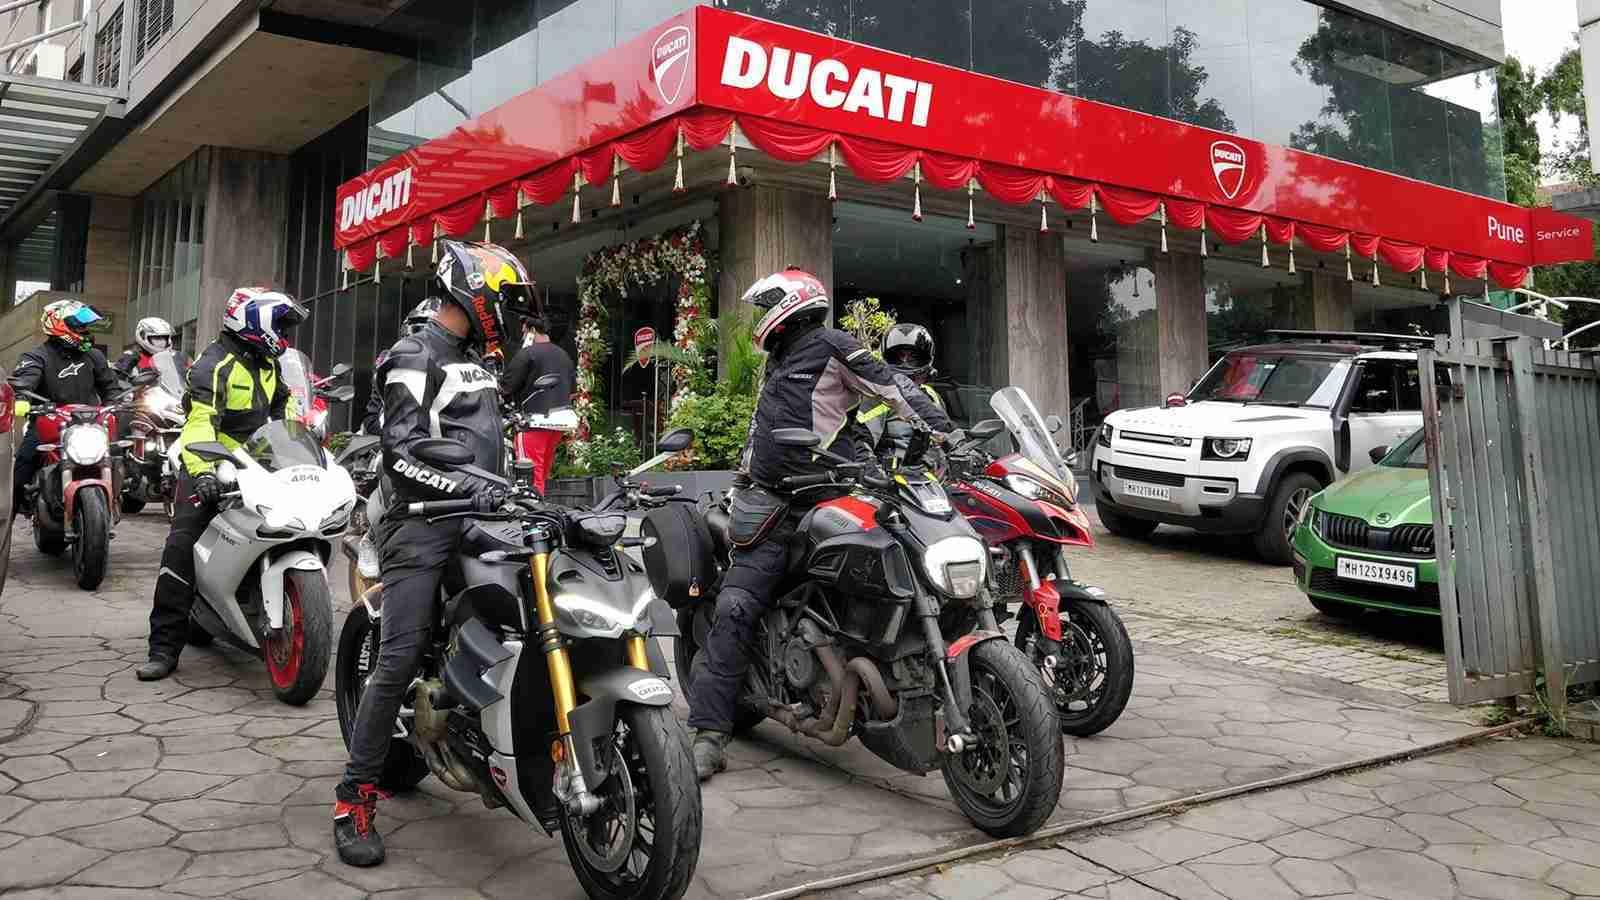 Ducati opens new dealership in Pune